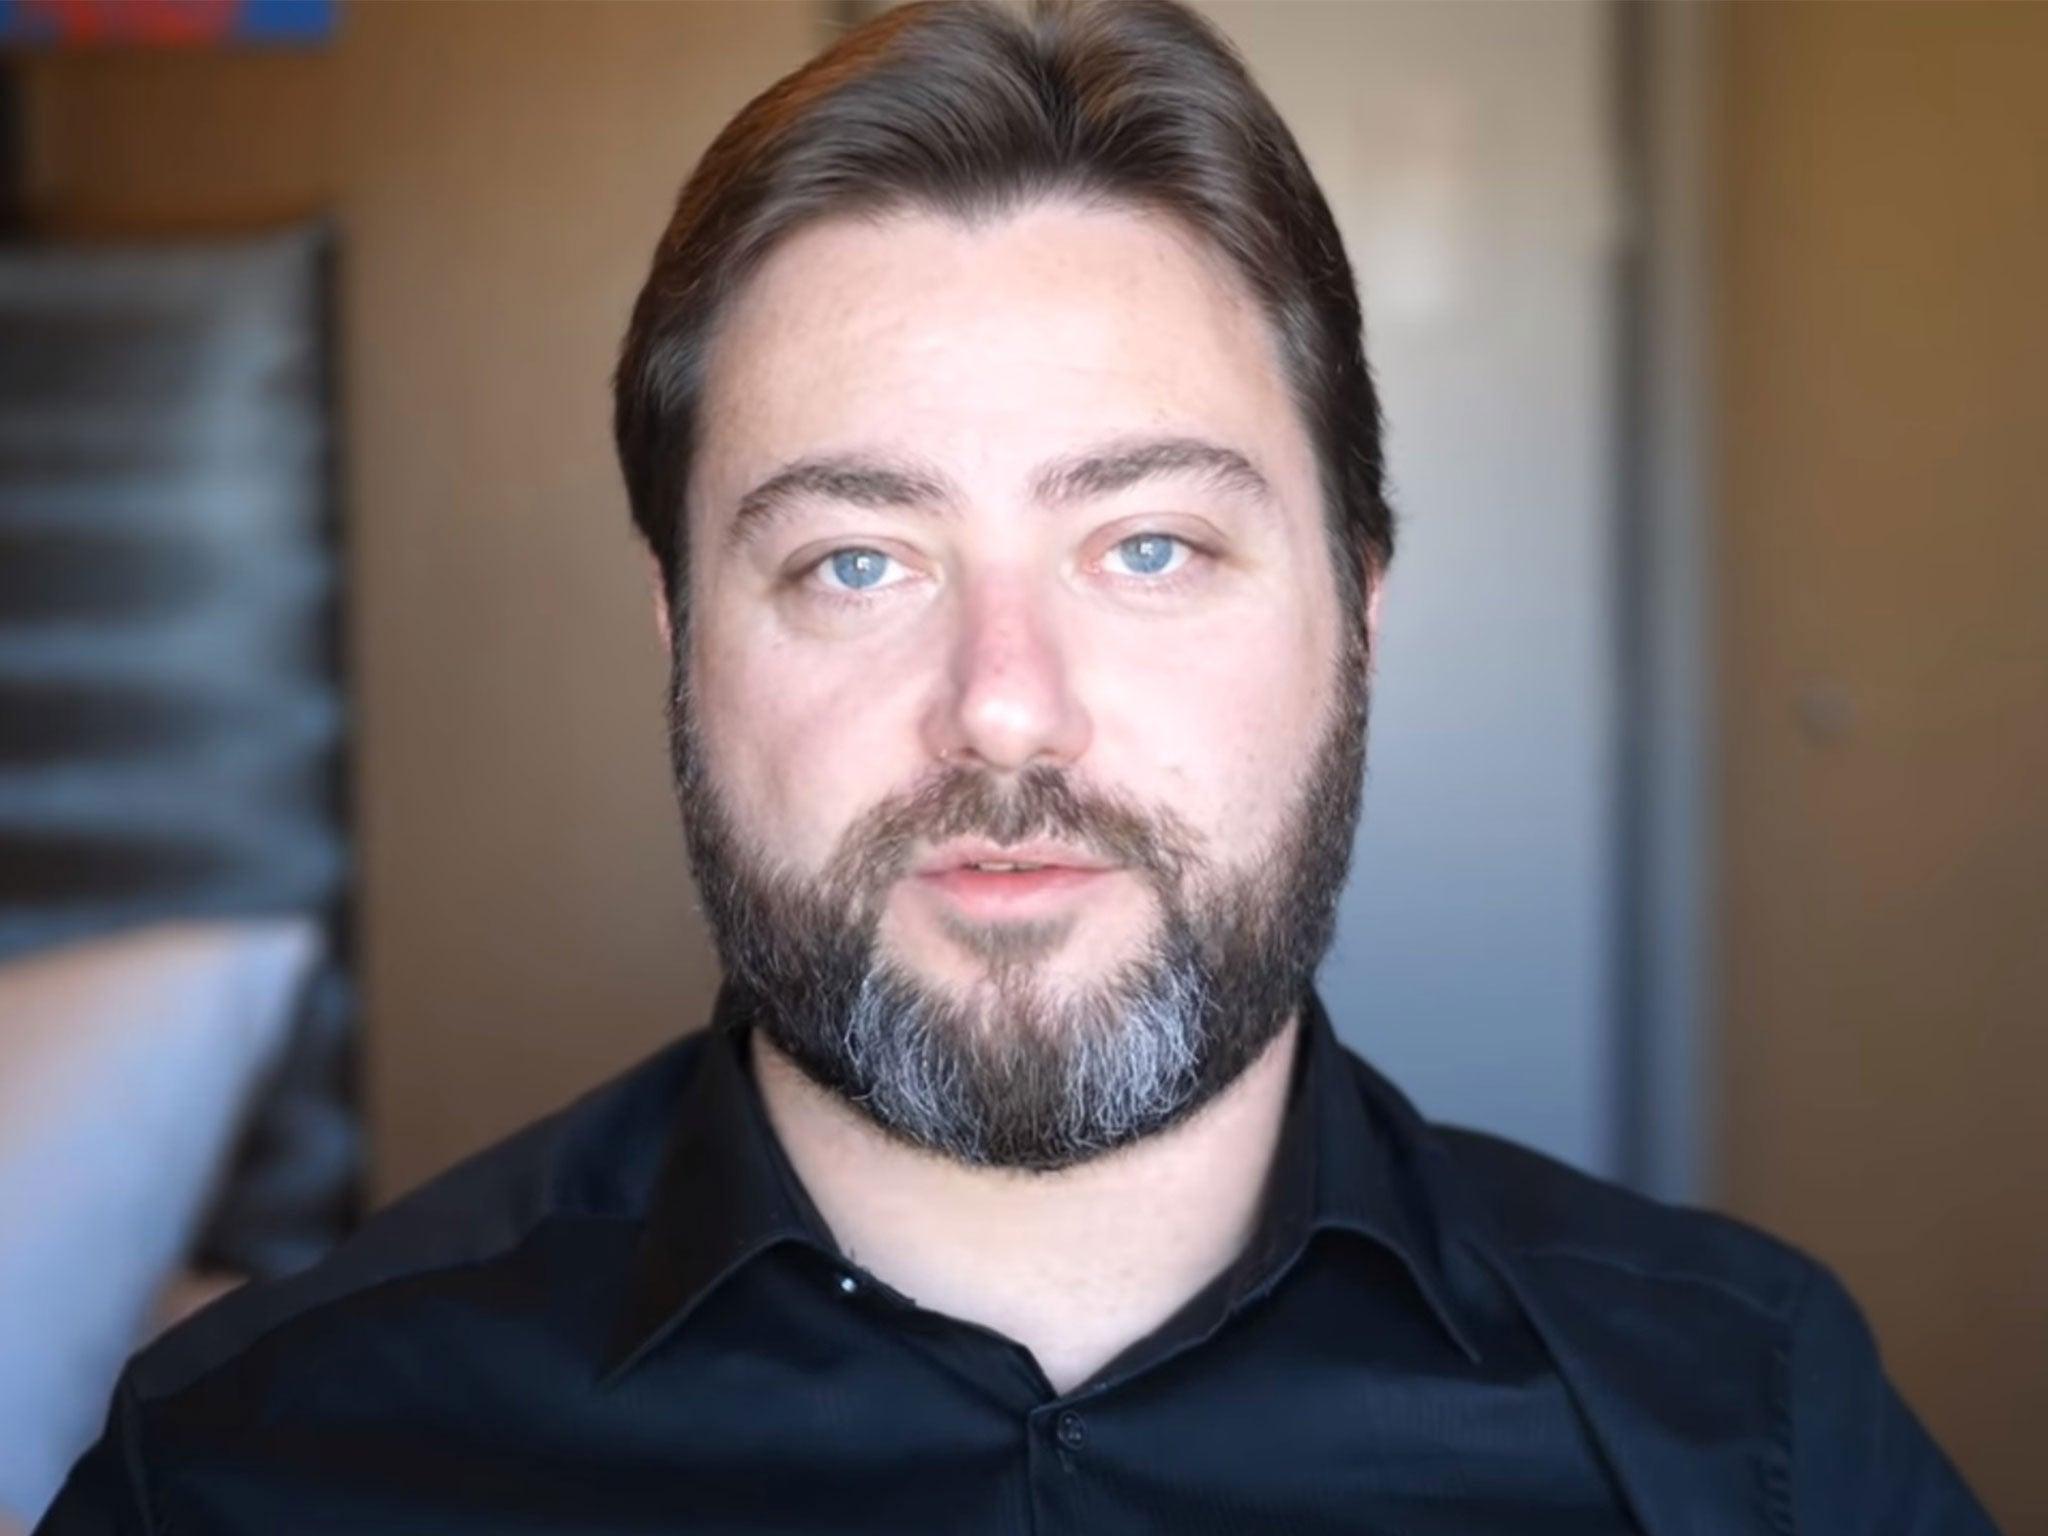 Anti-feminist YouTuber Sargon of Akkad selected as Ukip election candidate